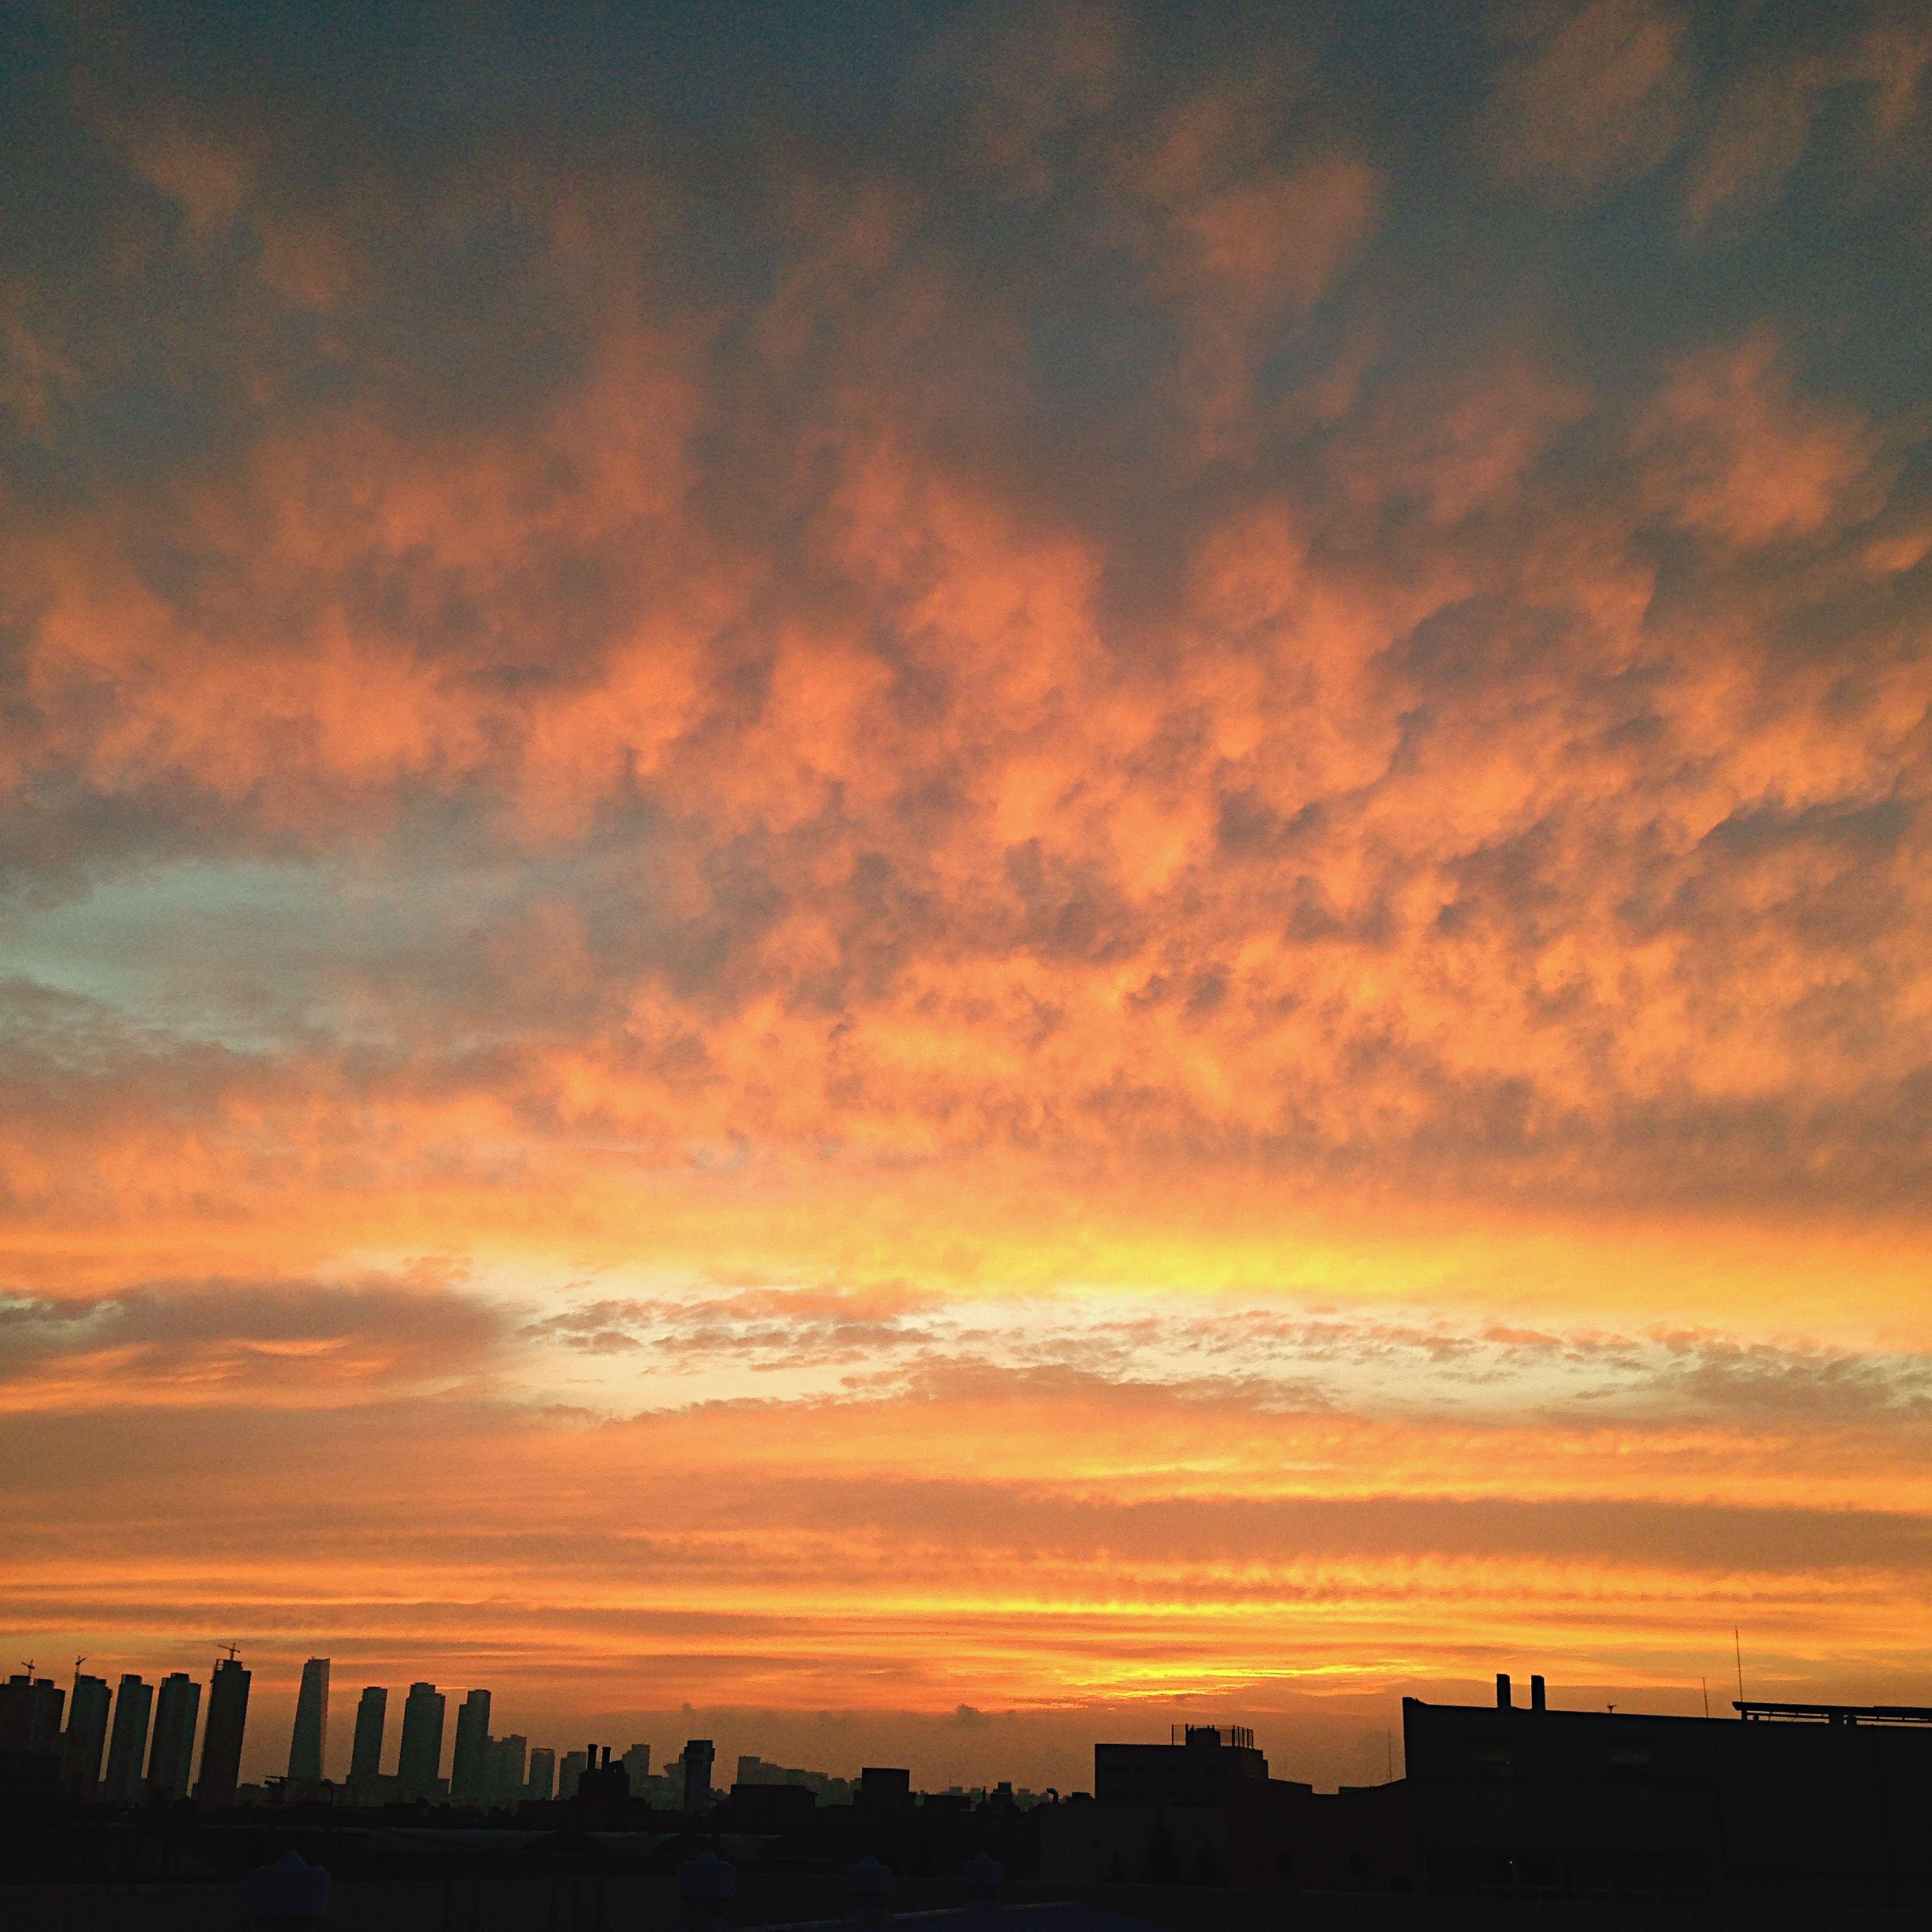 sunset, orange color, building exterior, architecture, silhouette, built structure, sky, cloud - sky, city, beauty in nature, scenics, dramatic sky, cloud, nature, cityscape, cloudy, outdoors, idyllic, building, no people